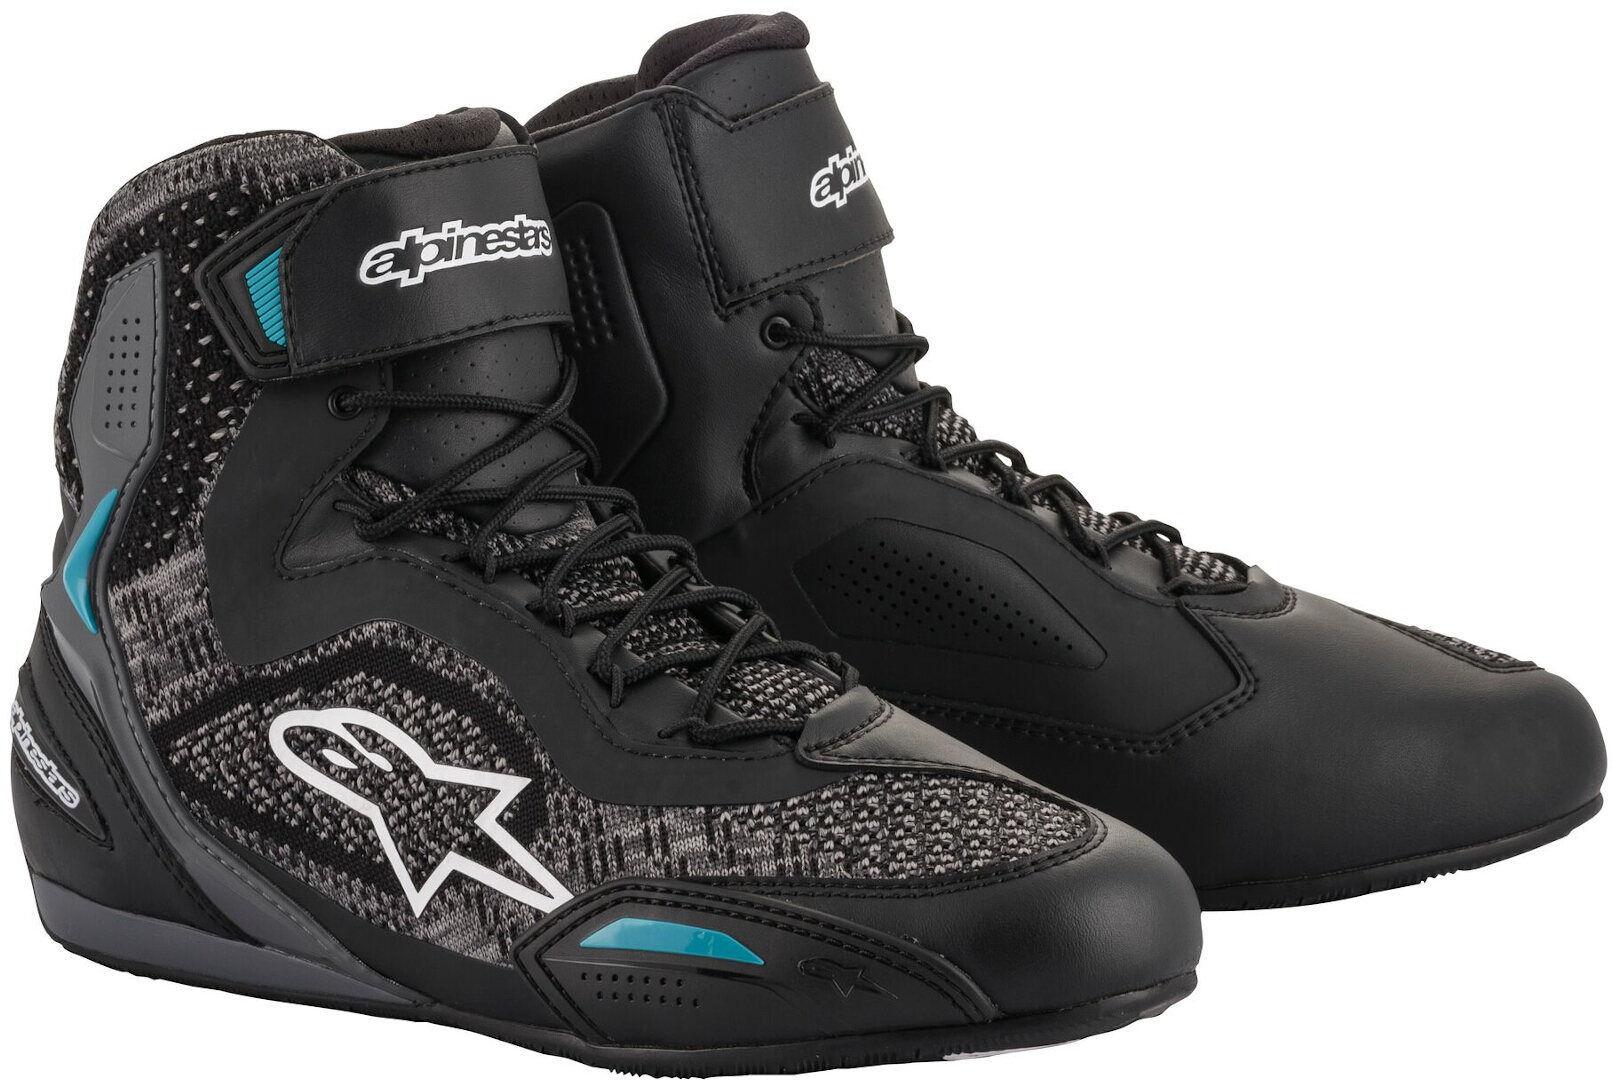 Alpinestars Stella Faster-3 Rideknit Chaussures de moto pour dames Noir Blanc Bleu taille : 43